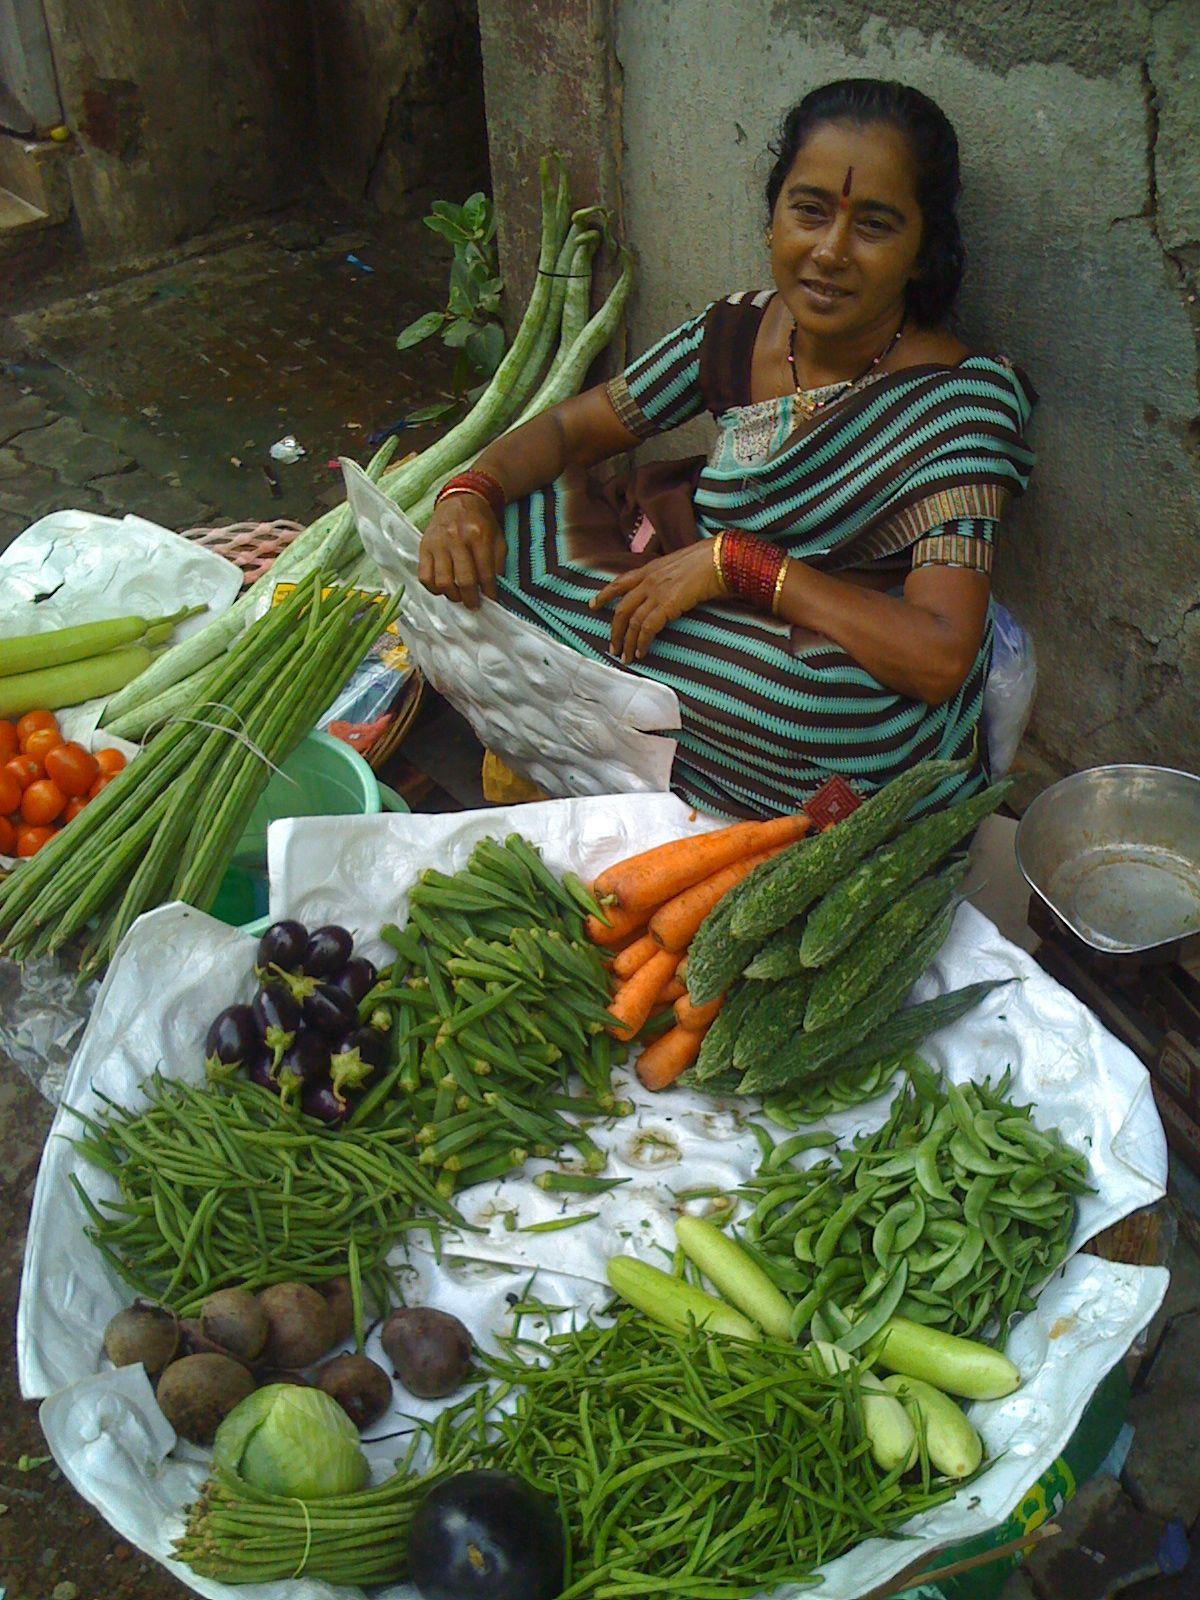 Vegetable vendor in public market, Bandra West, India